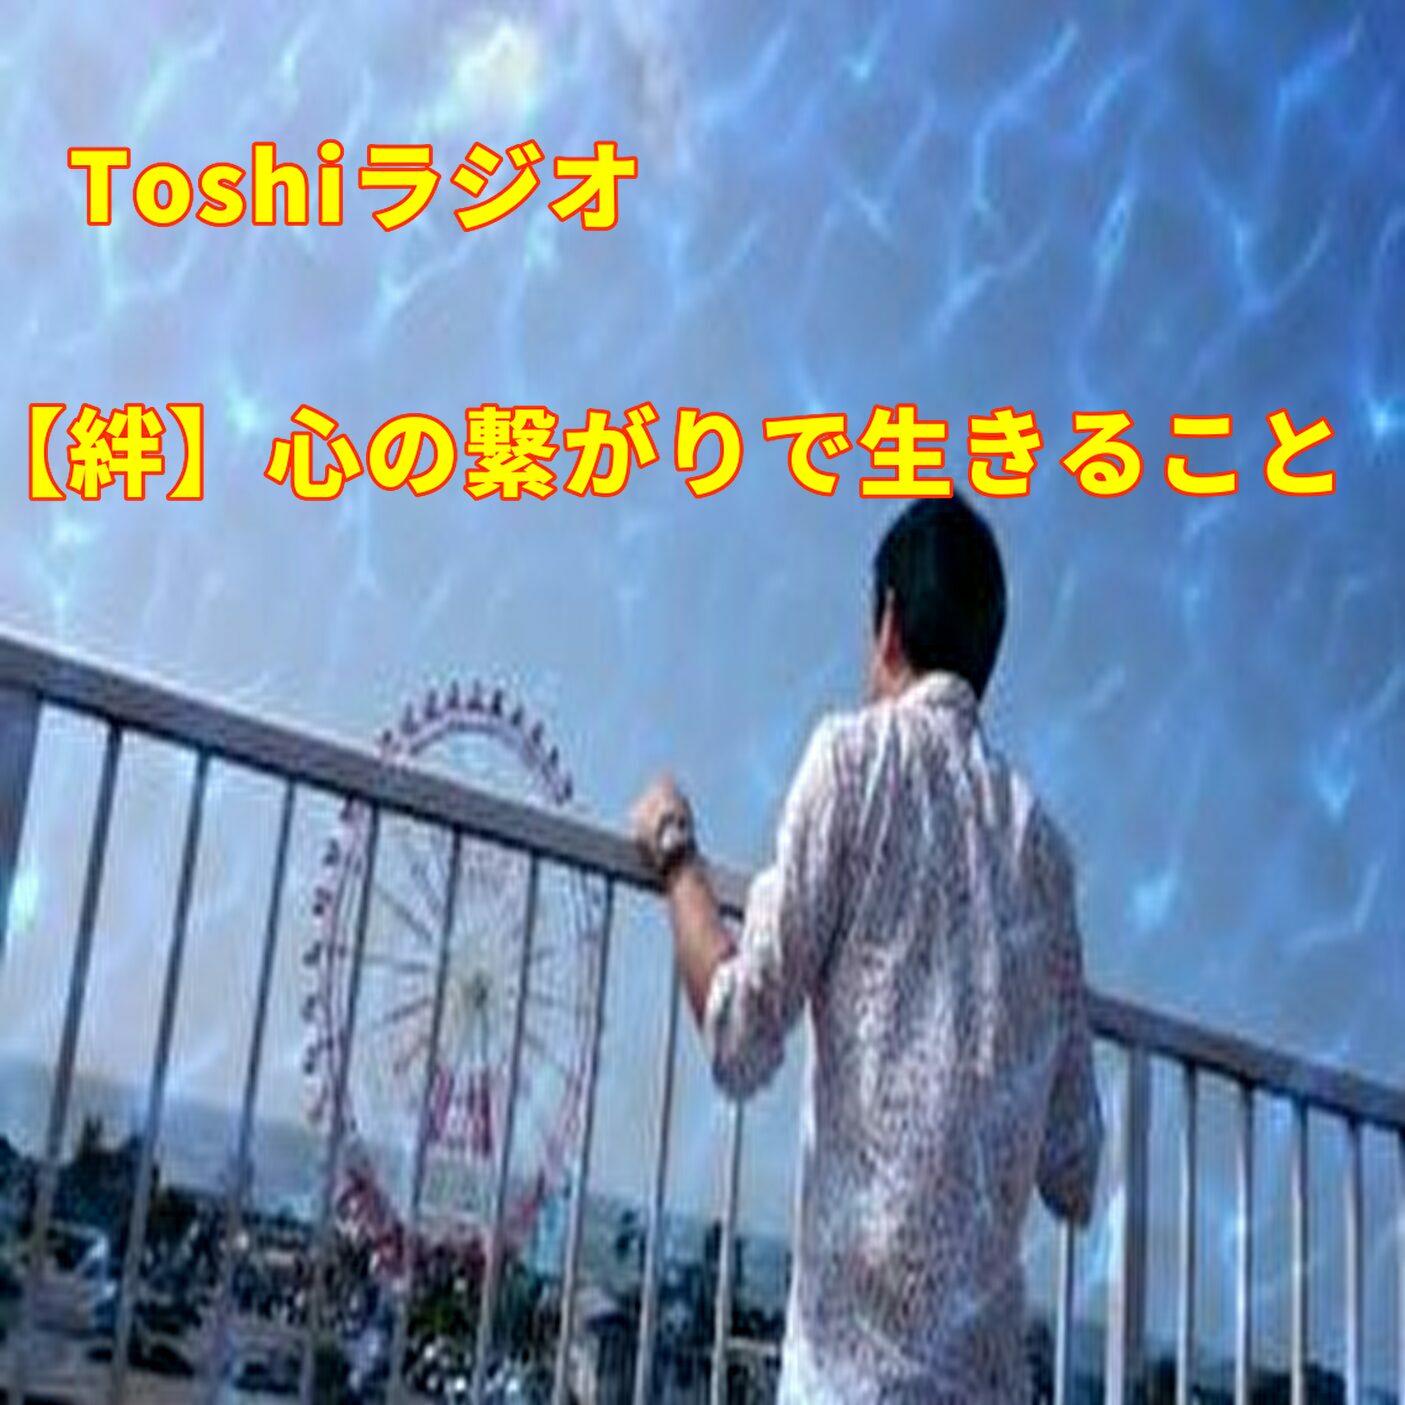 Toshiラジオ心の繋がりで生きること